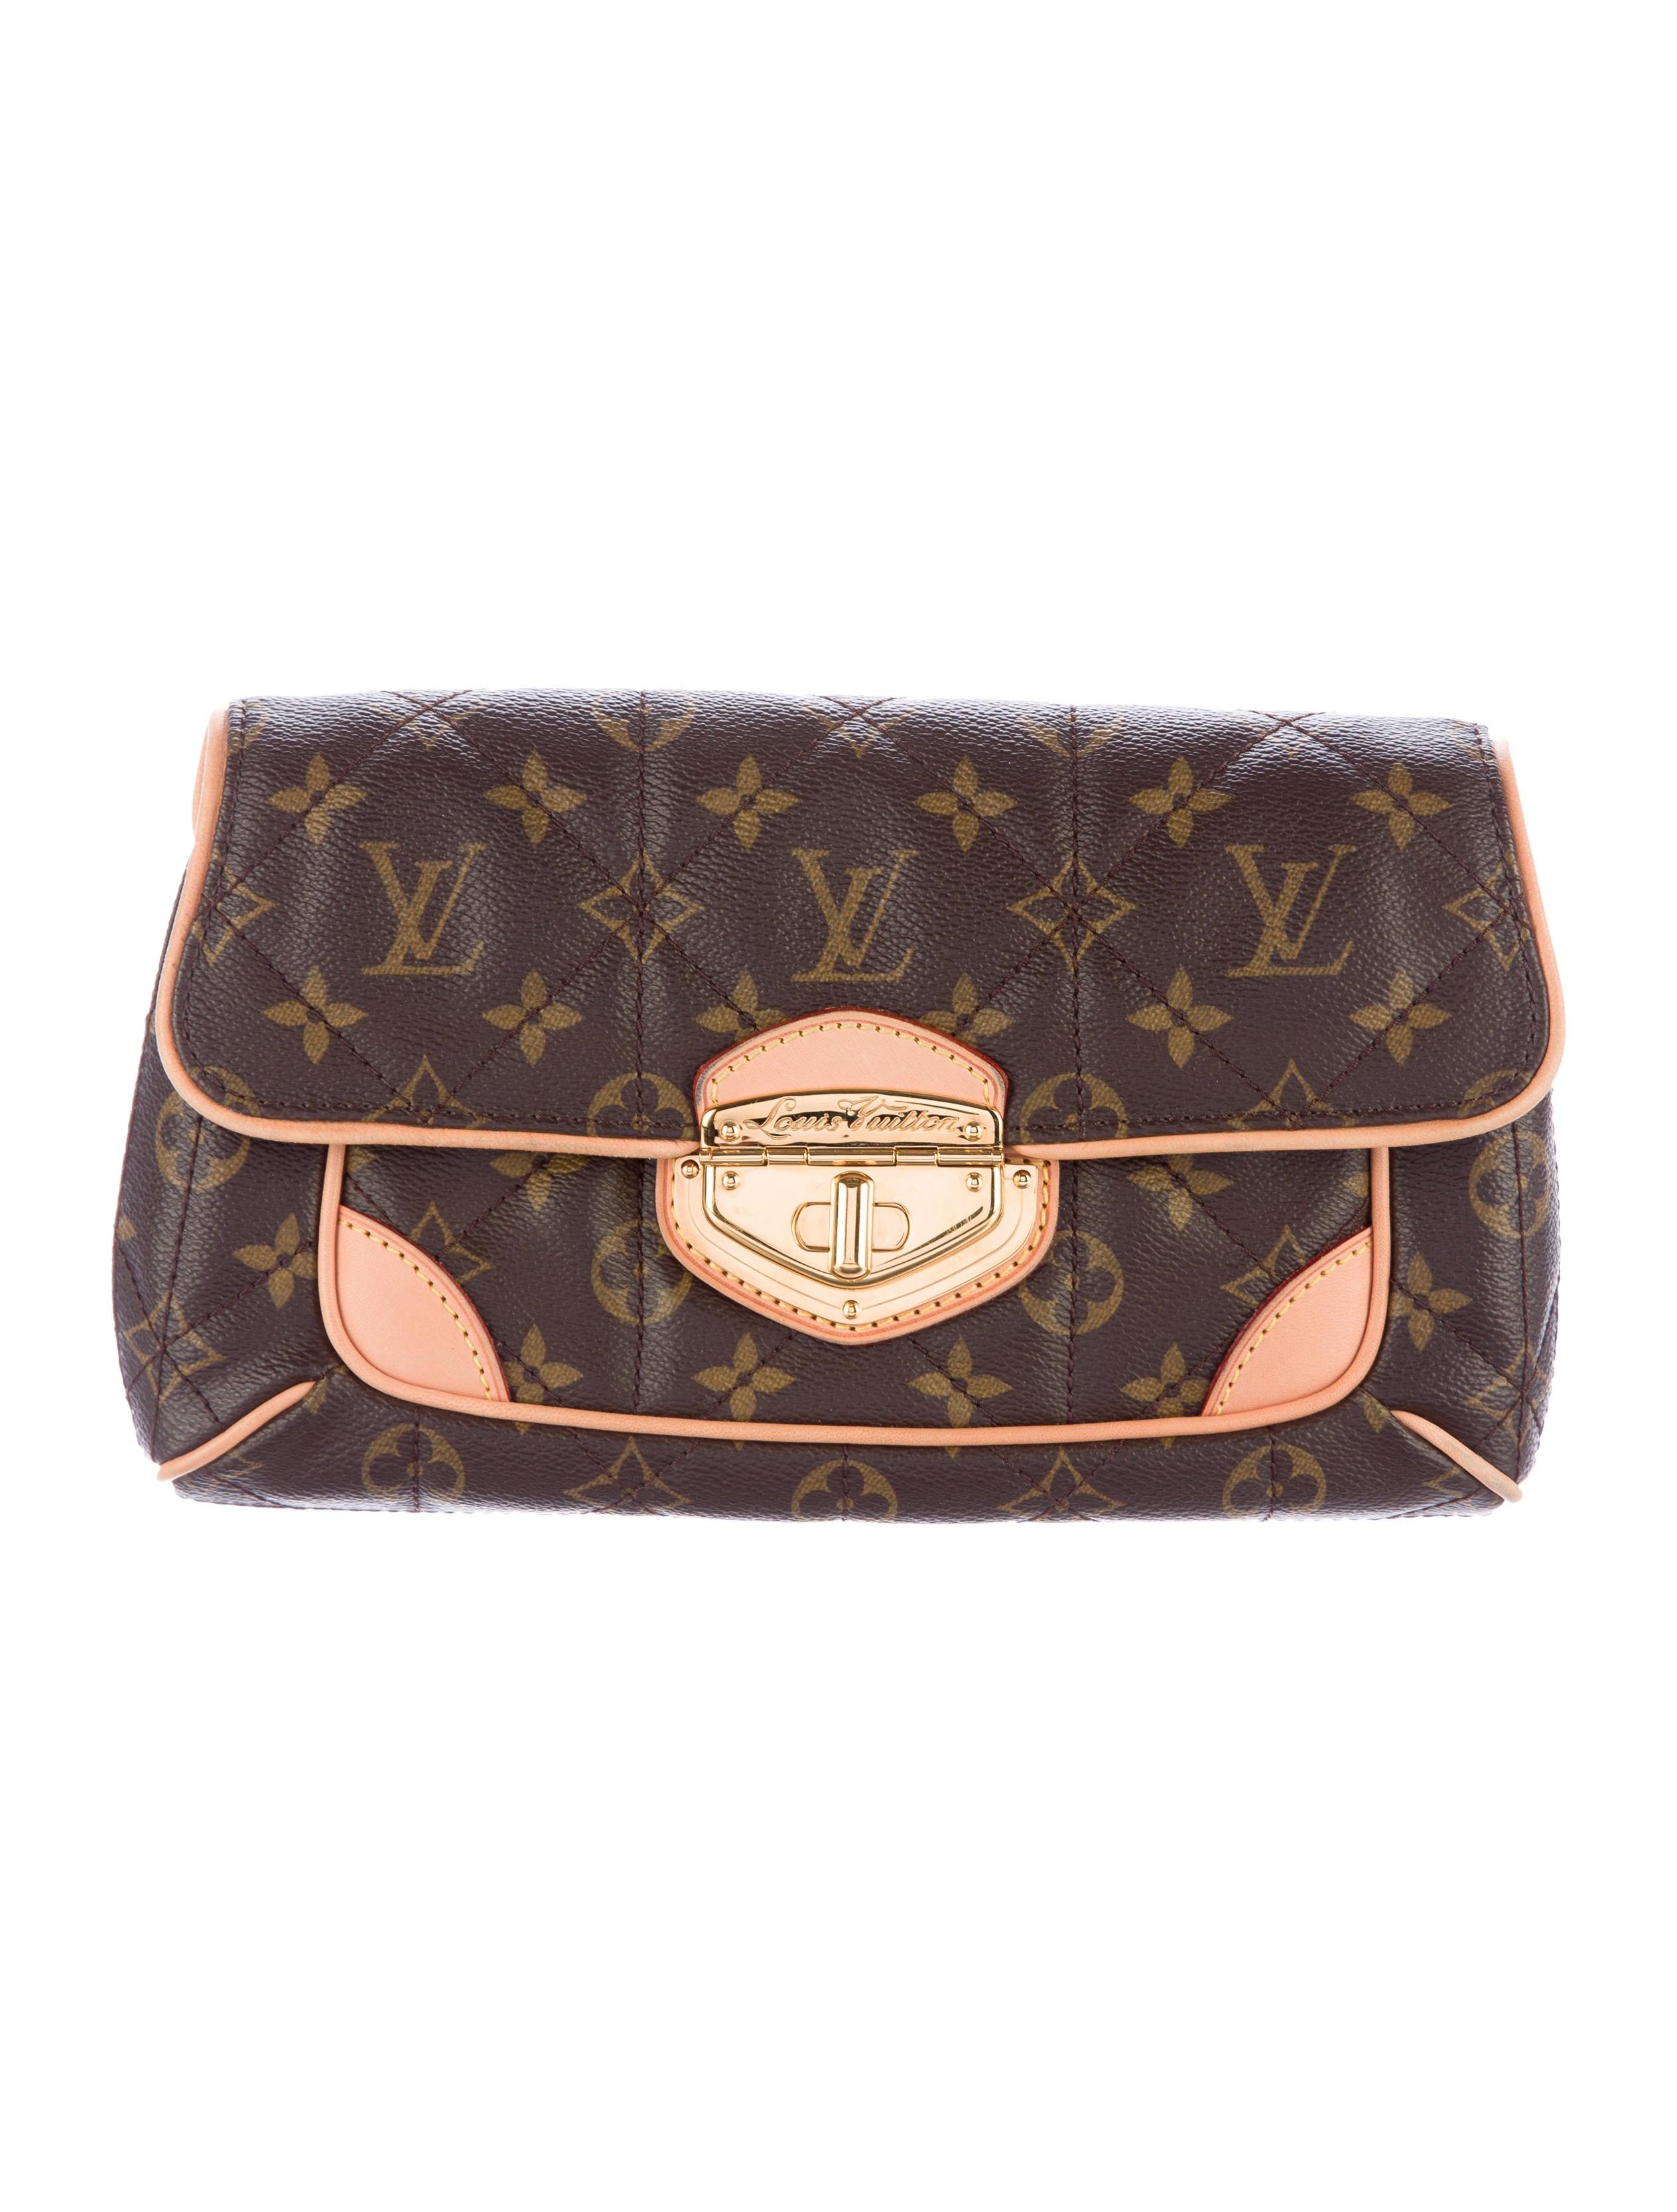 Louis vuitton handbags brown